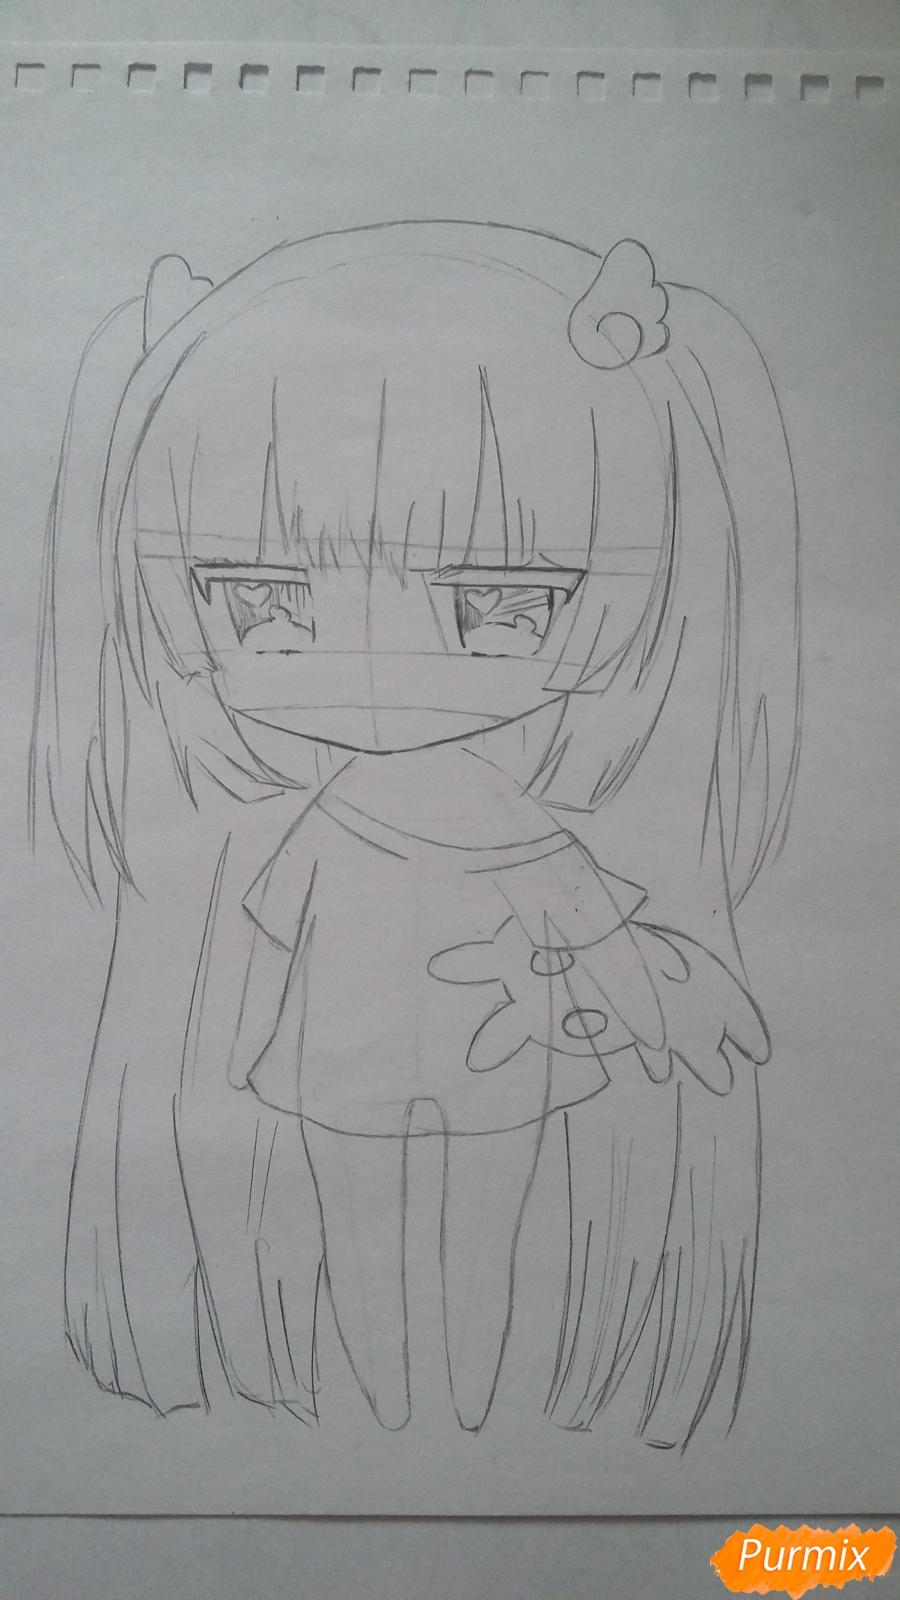 Рисуем милую чиби-тян в пижаме и игрушкой в руке карандашами - шаг 6